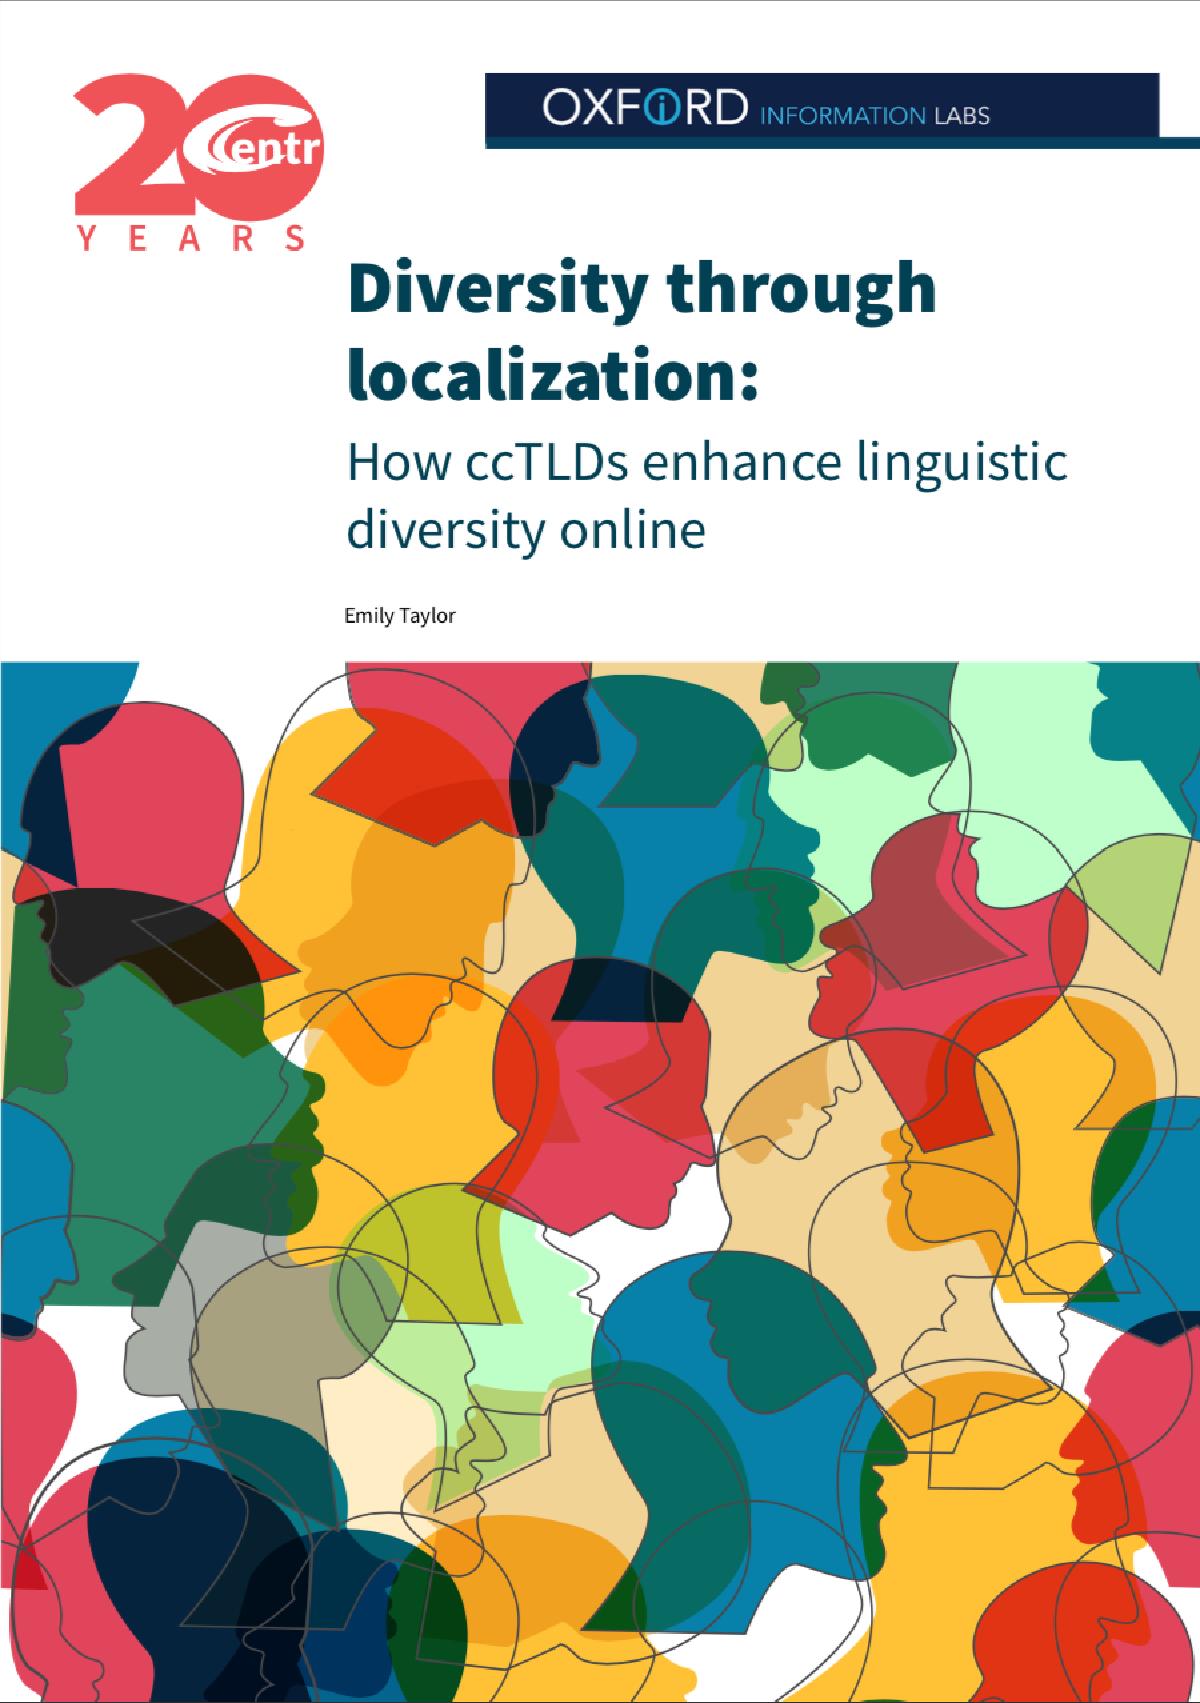 Ceptr diversity through localization: how cctlds enhance